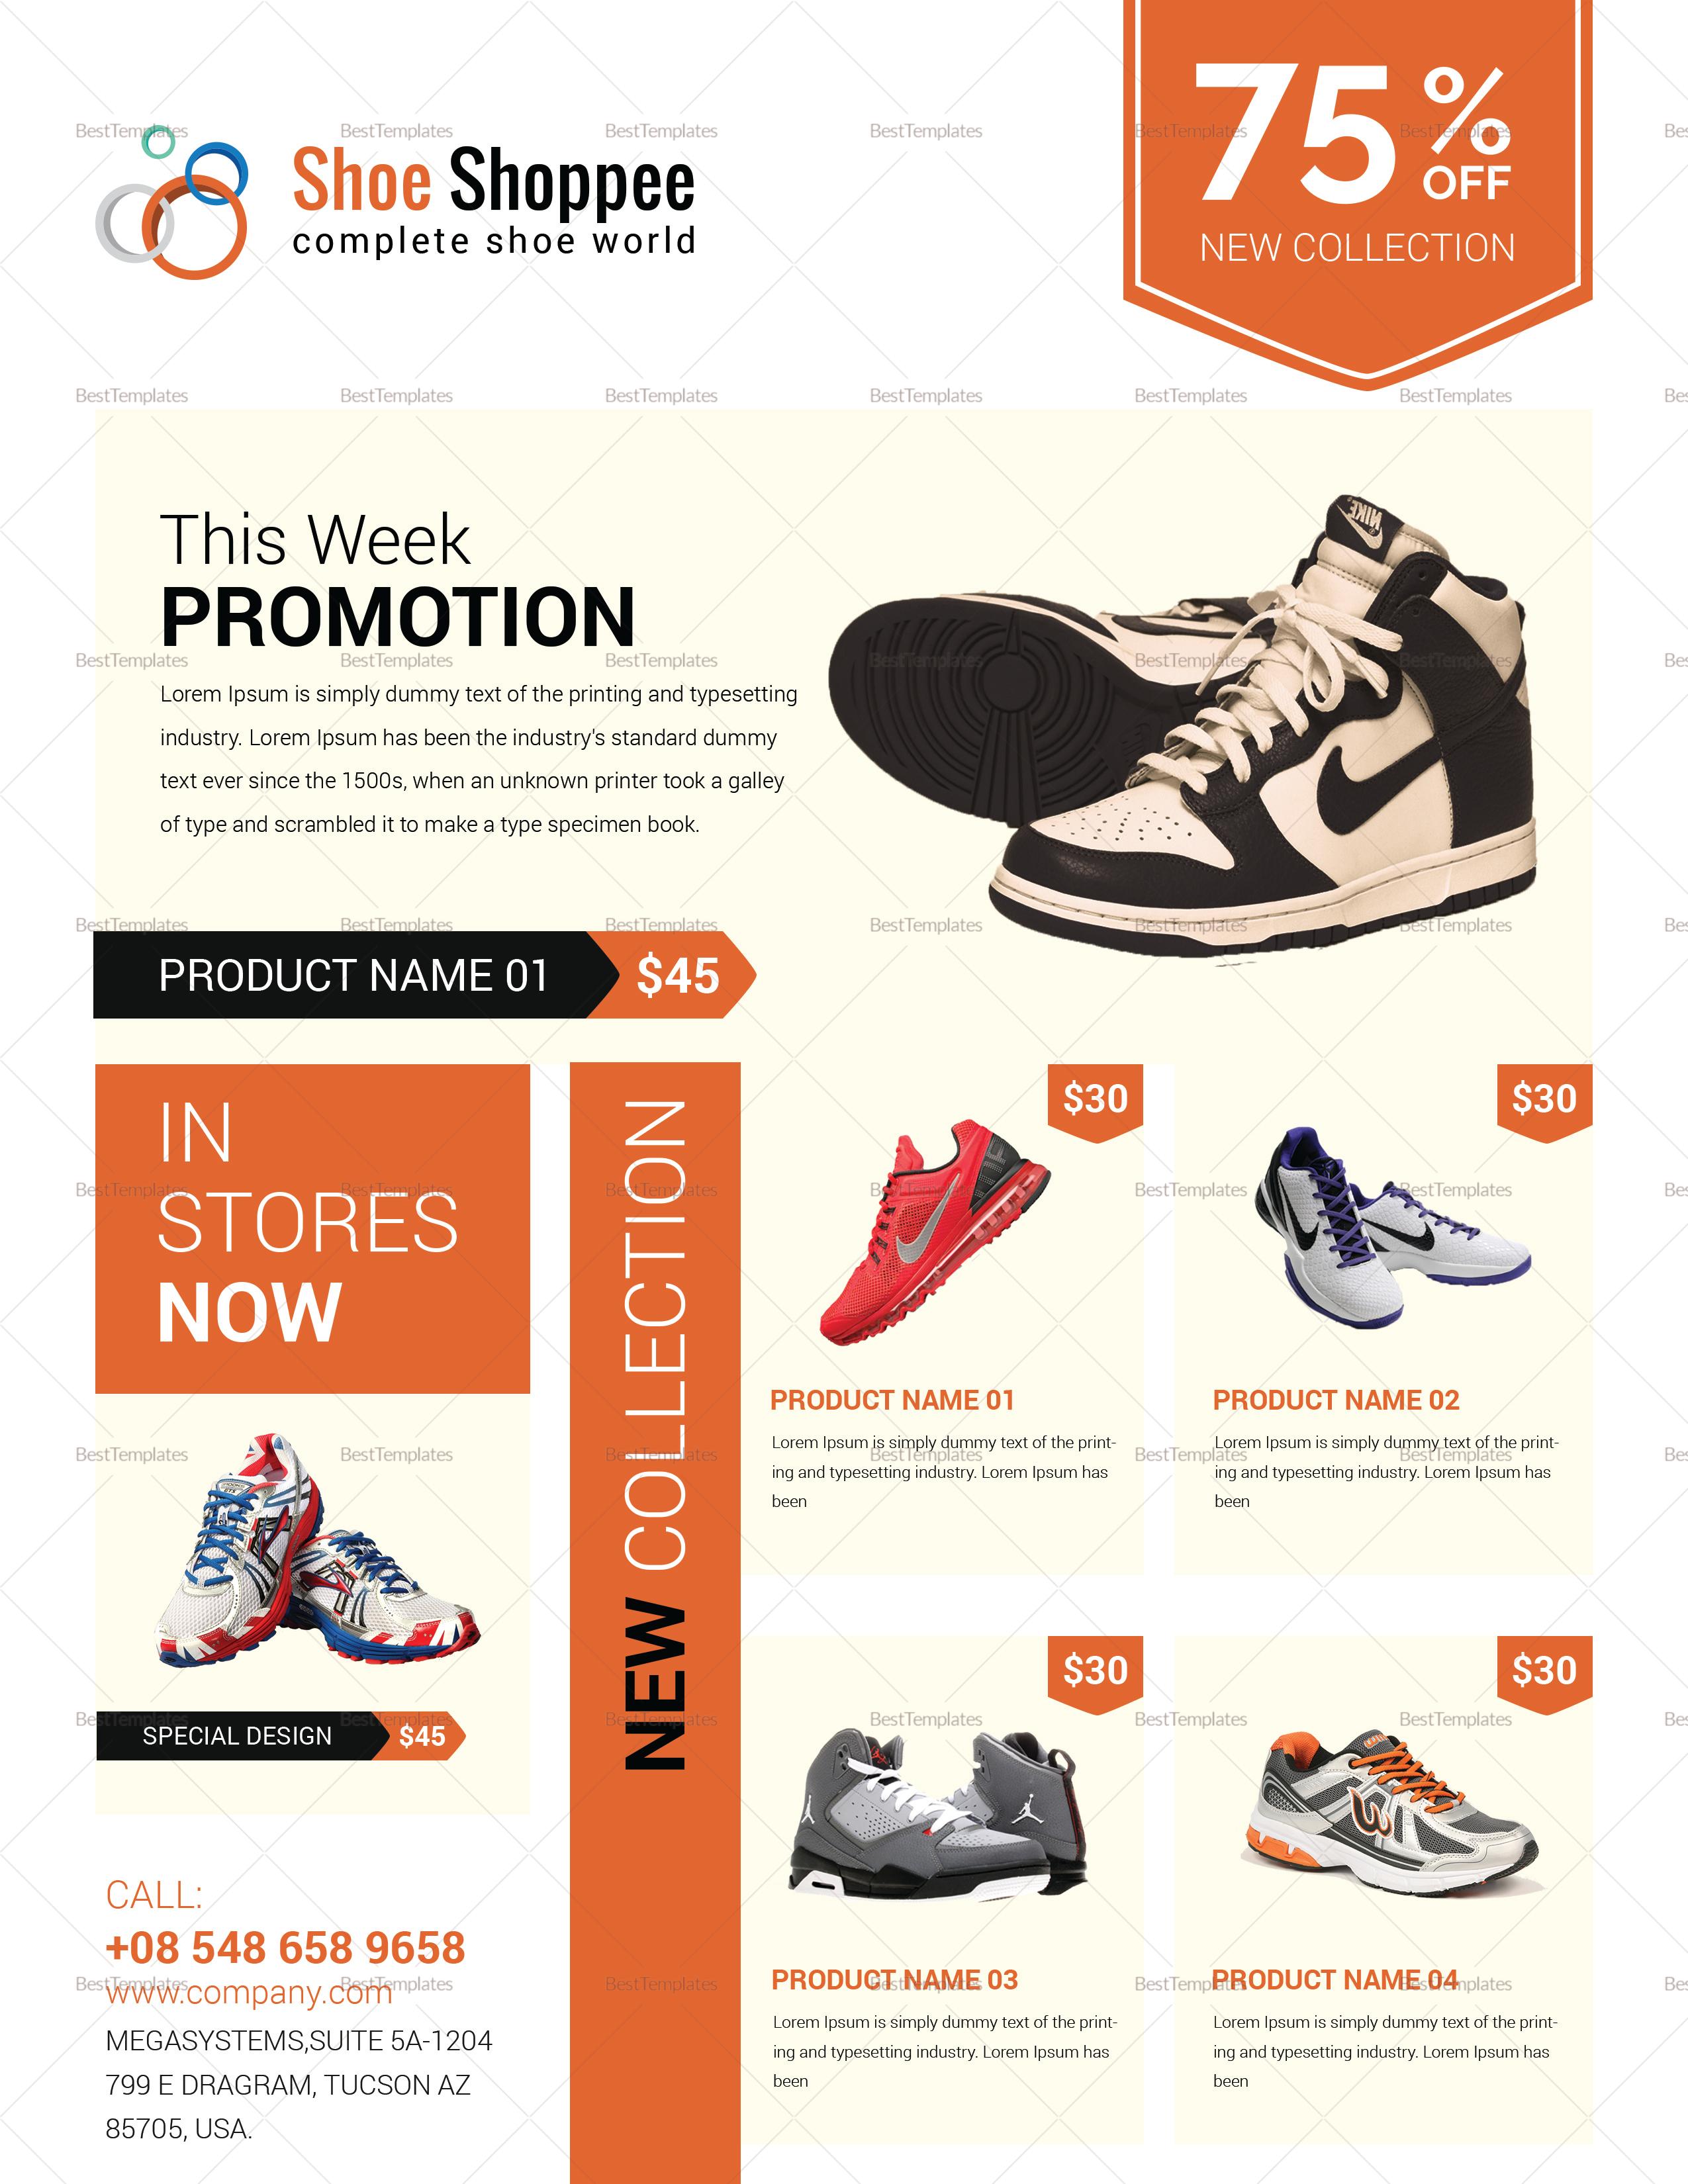 shoe product sale flyer design template in word psd publisher. Black Bedroom Furniture Sets. Home Design Ideas